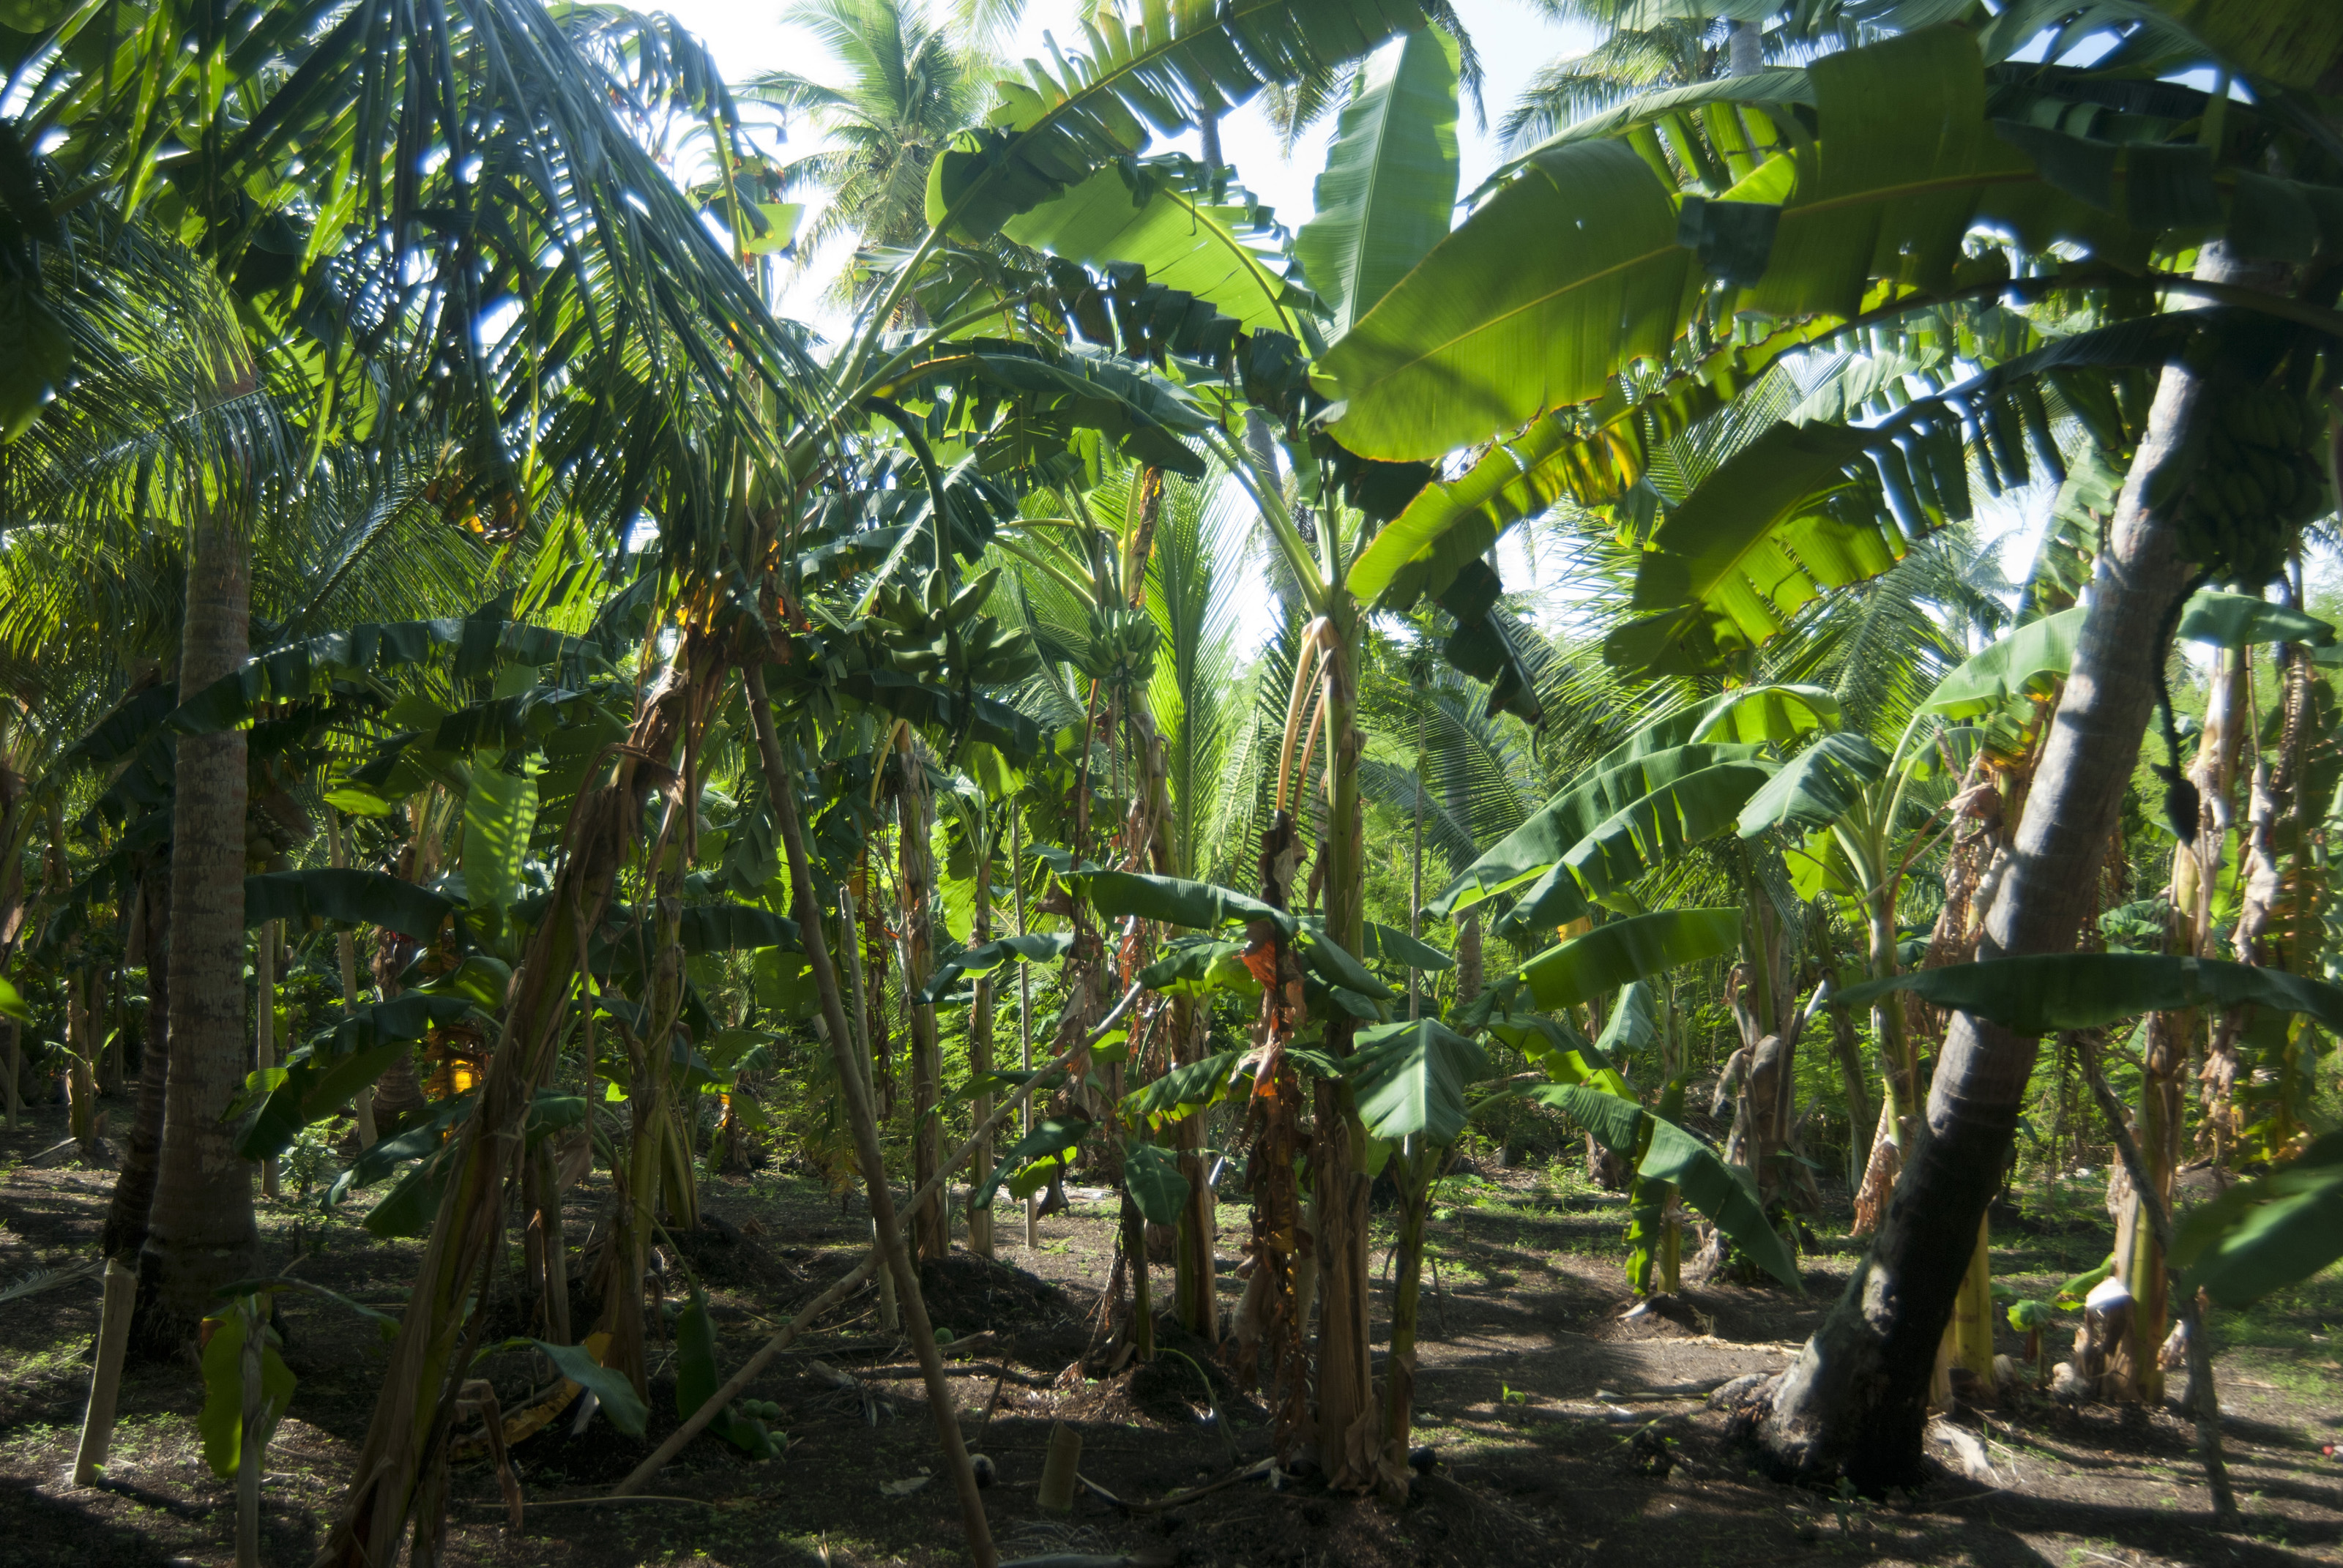 Banana Plantation Wallpapers High Quality | Download Free